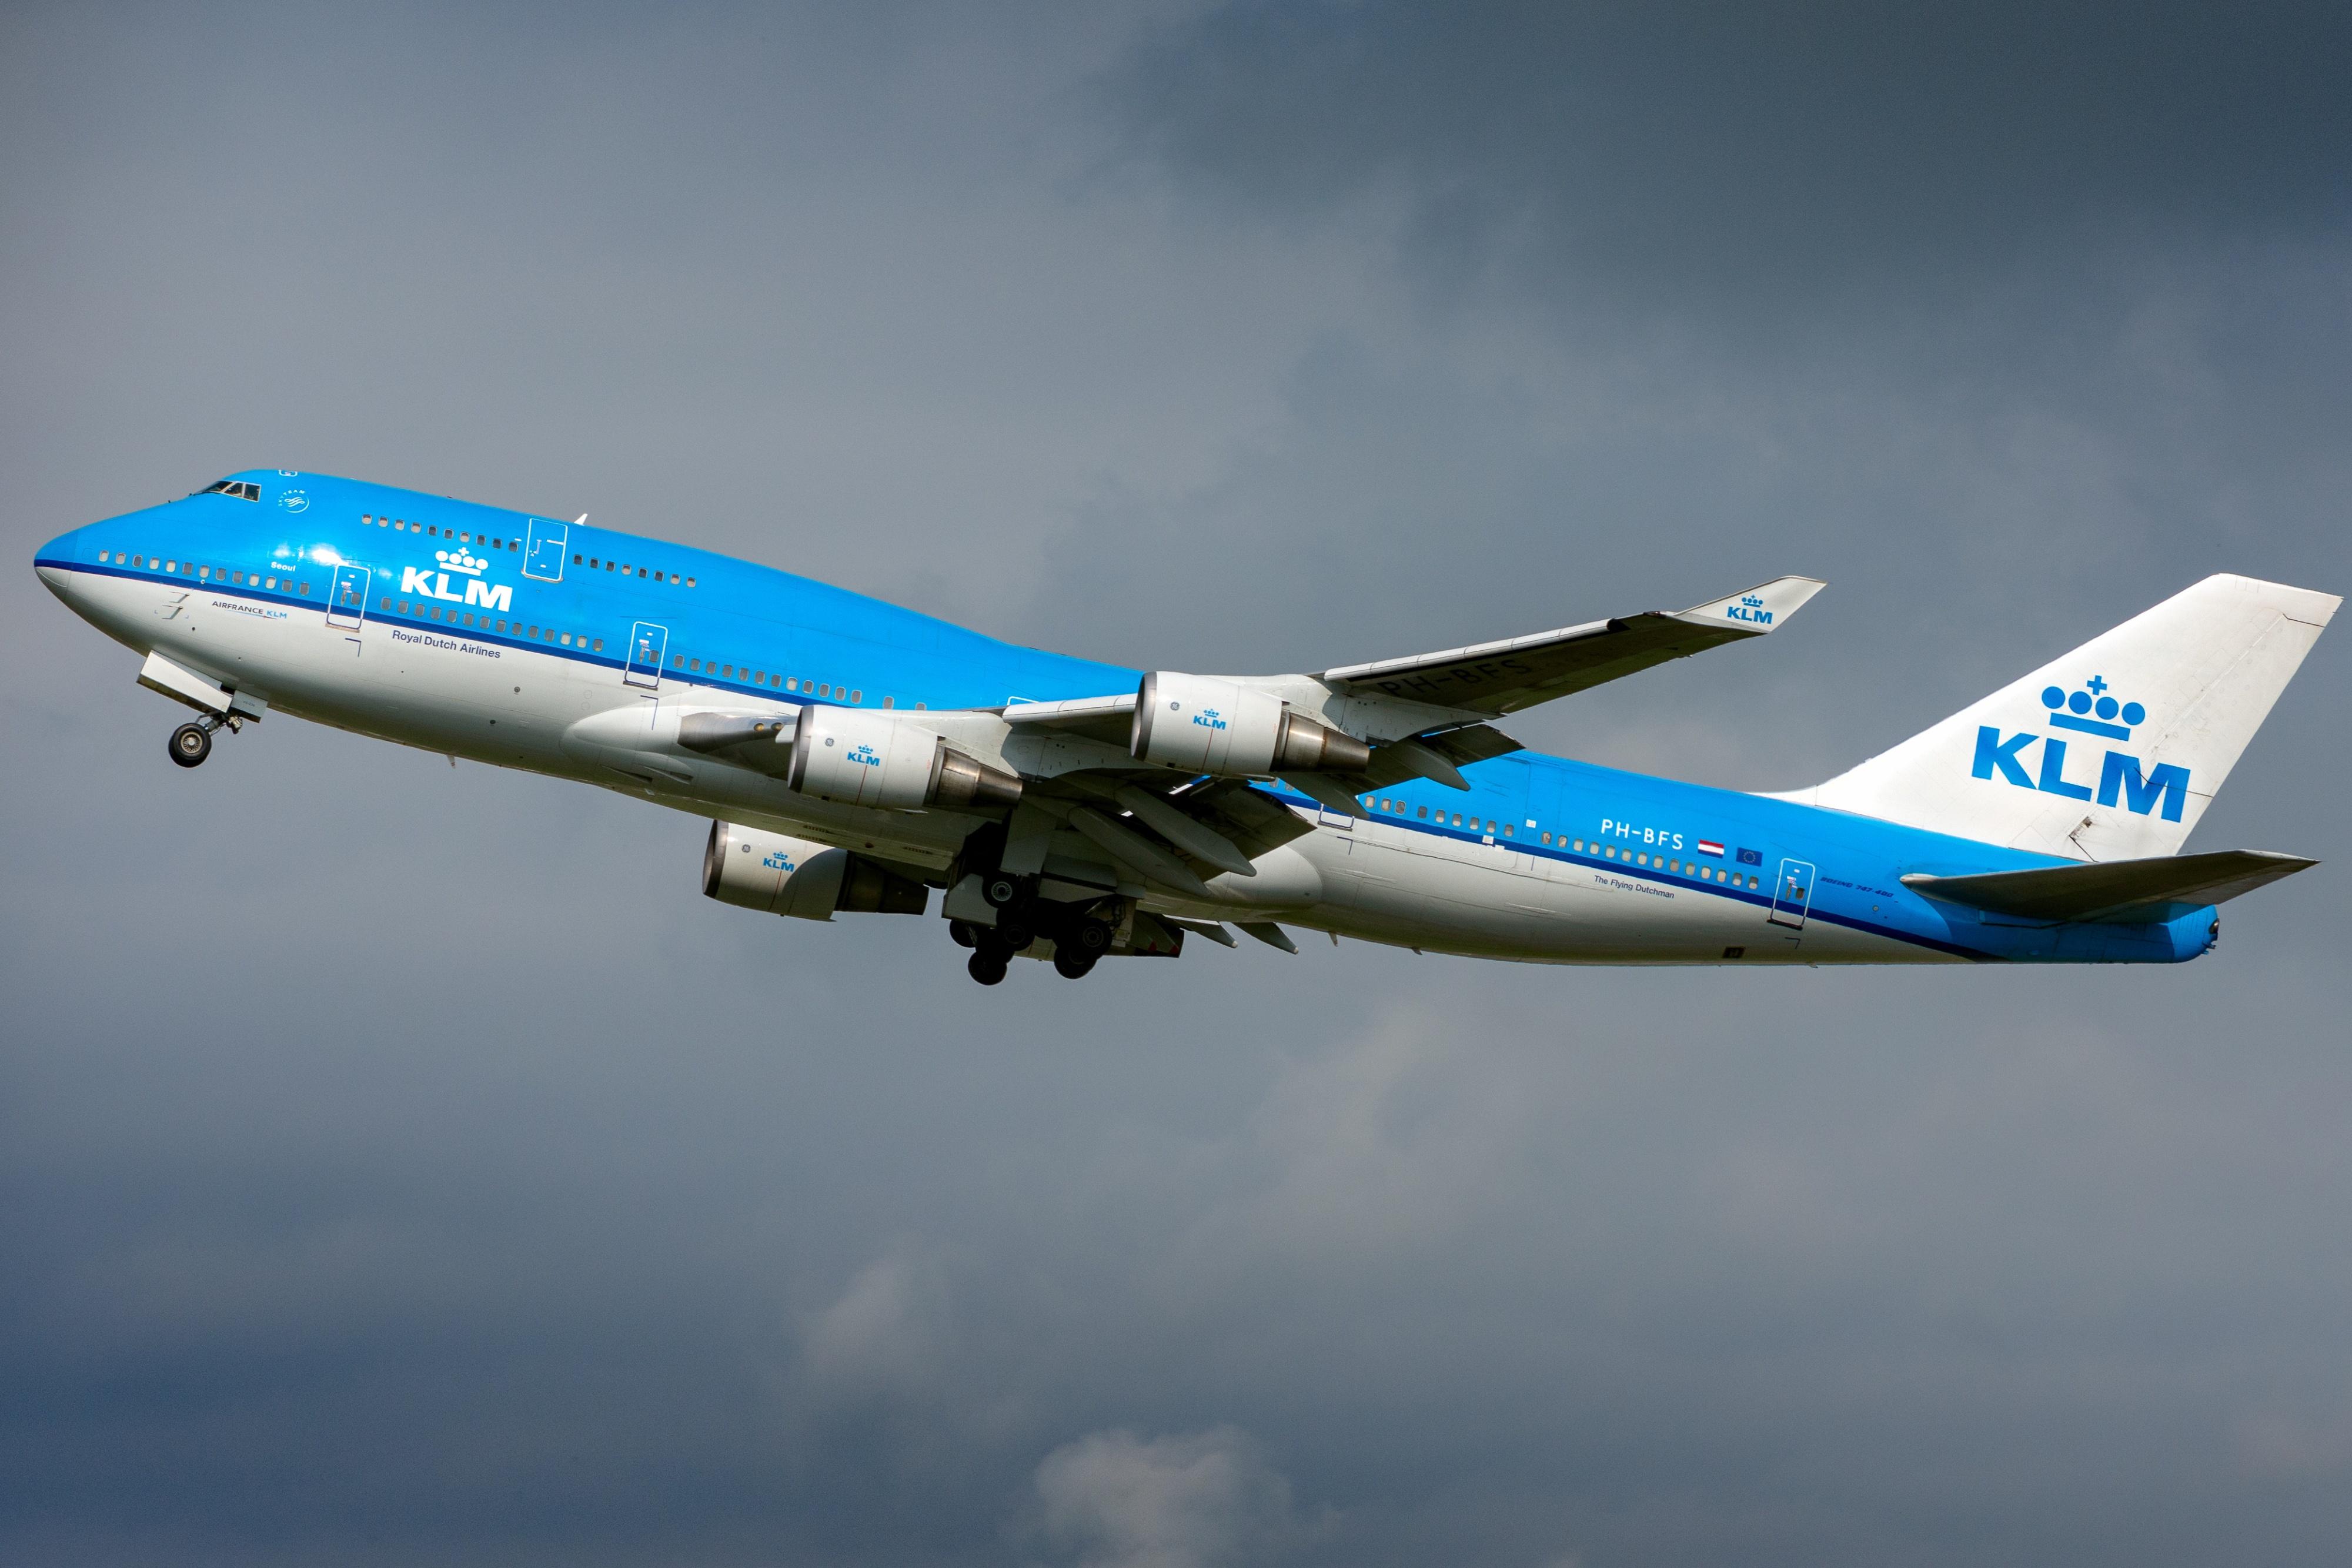 zdjęcia Boeing Samoloty Samolot pasażerski KLM 747-400M Lotnictwo 4000x2667 samolot